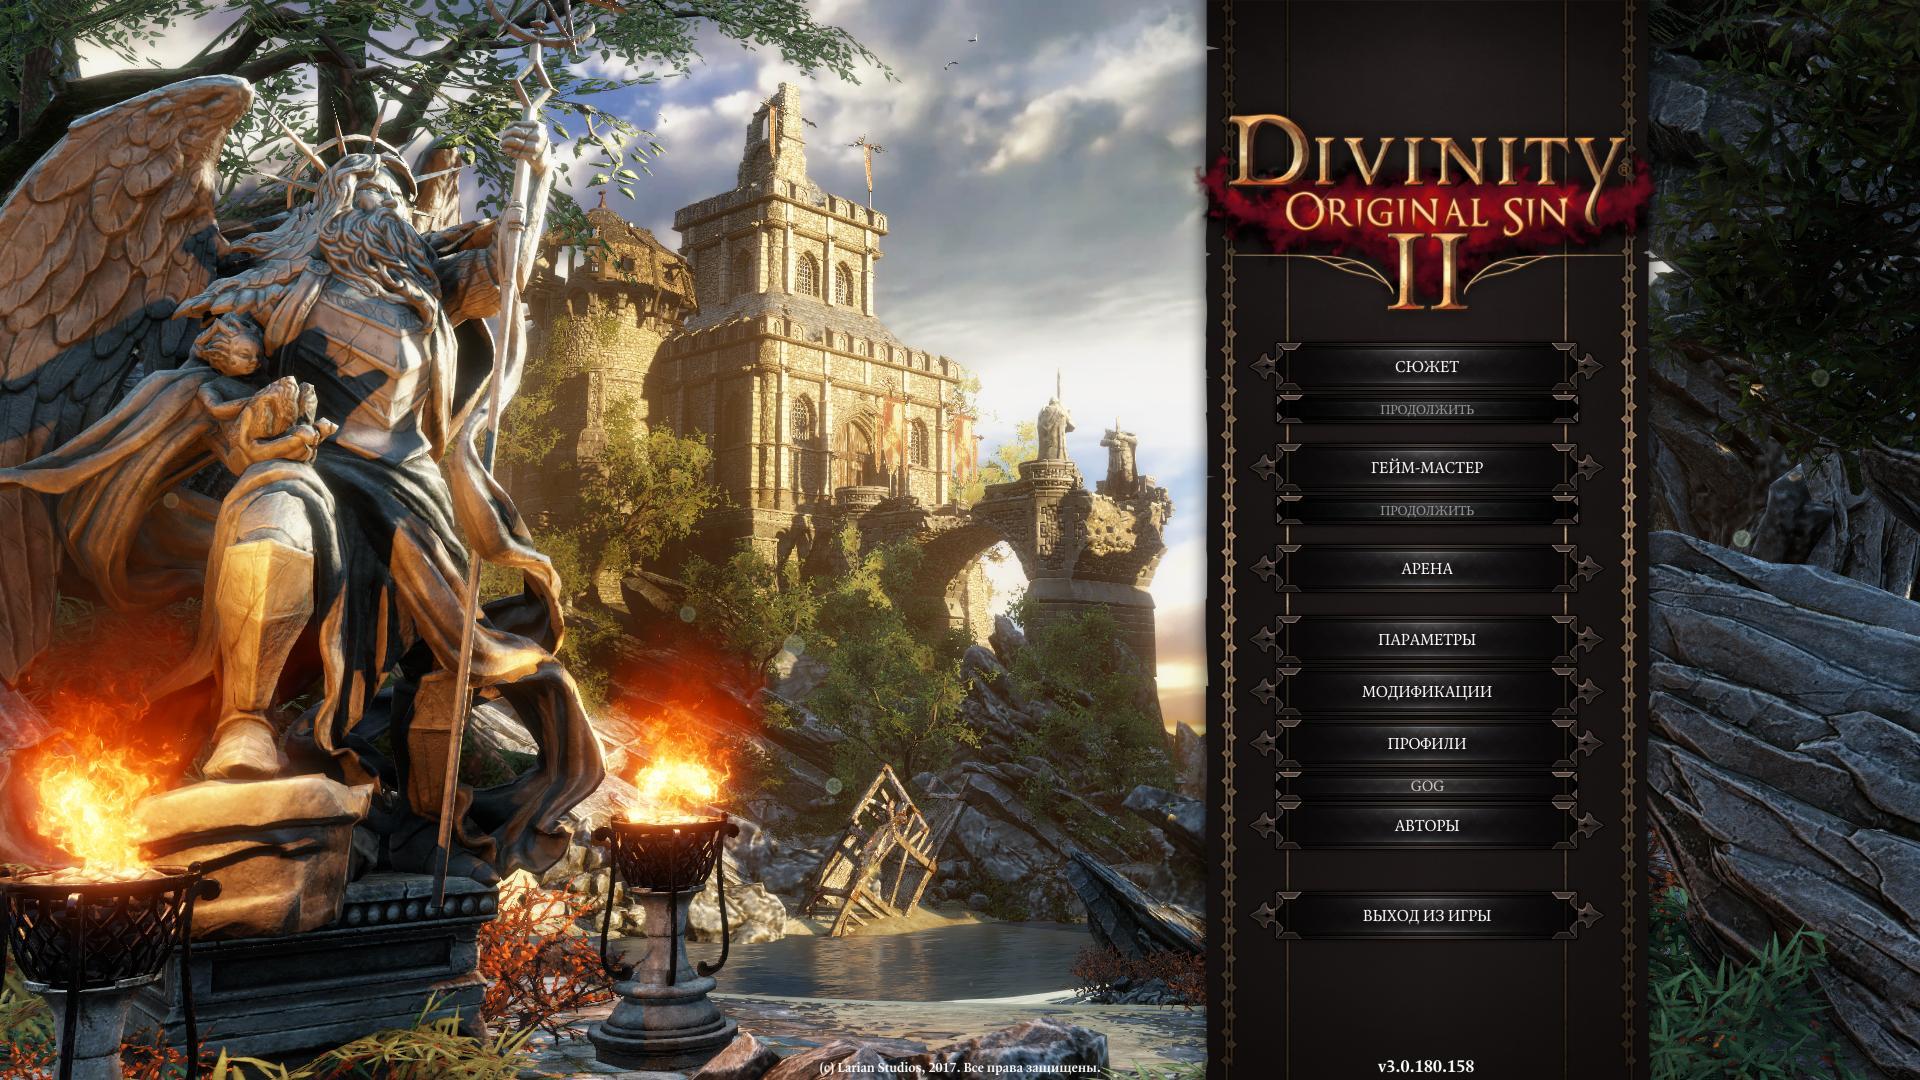 Divinity: Original Sin 2 [v 3.0.180.158] (2017) PC